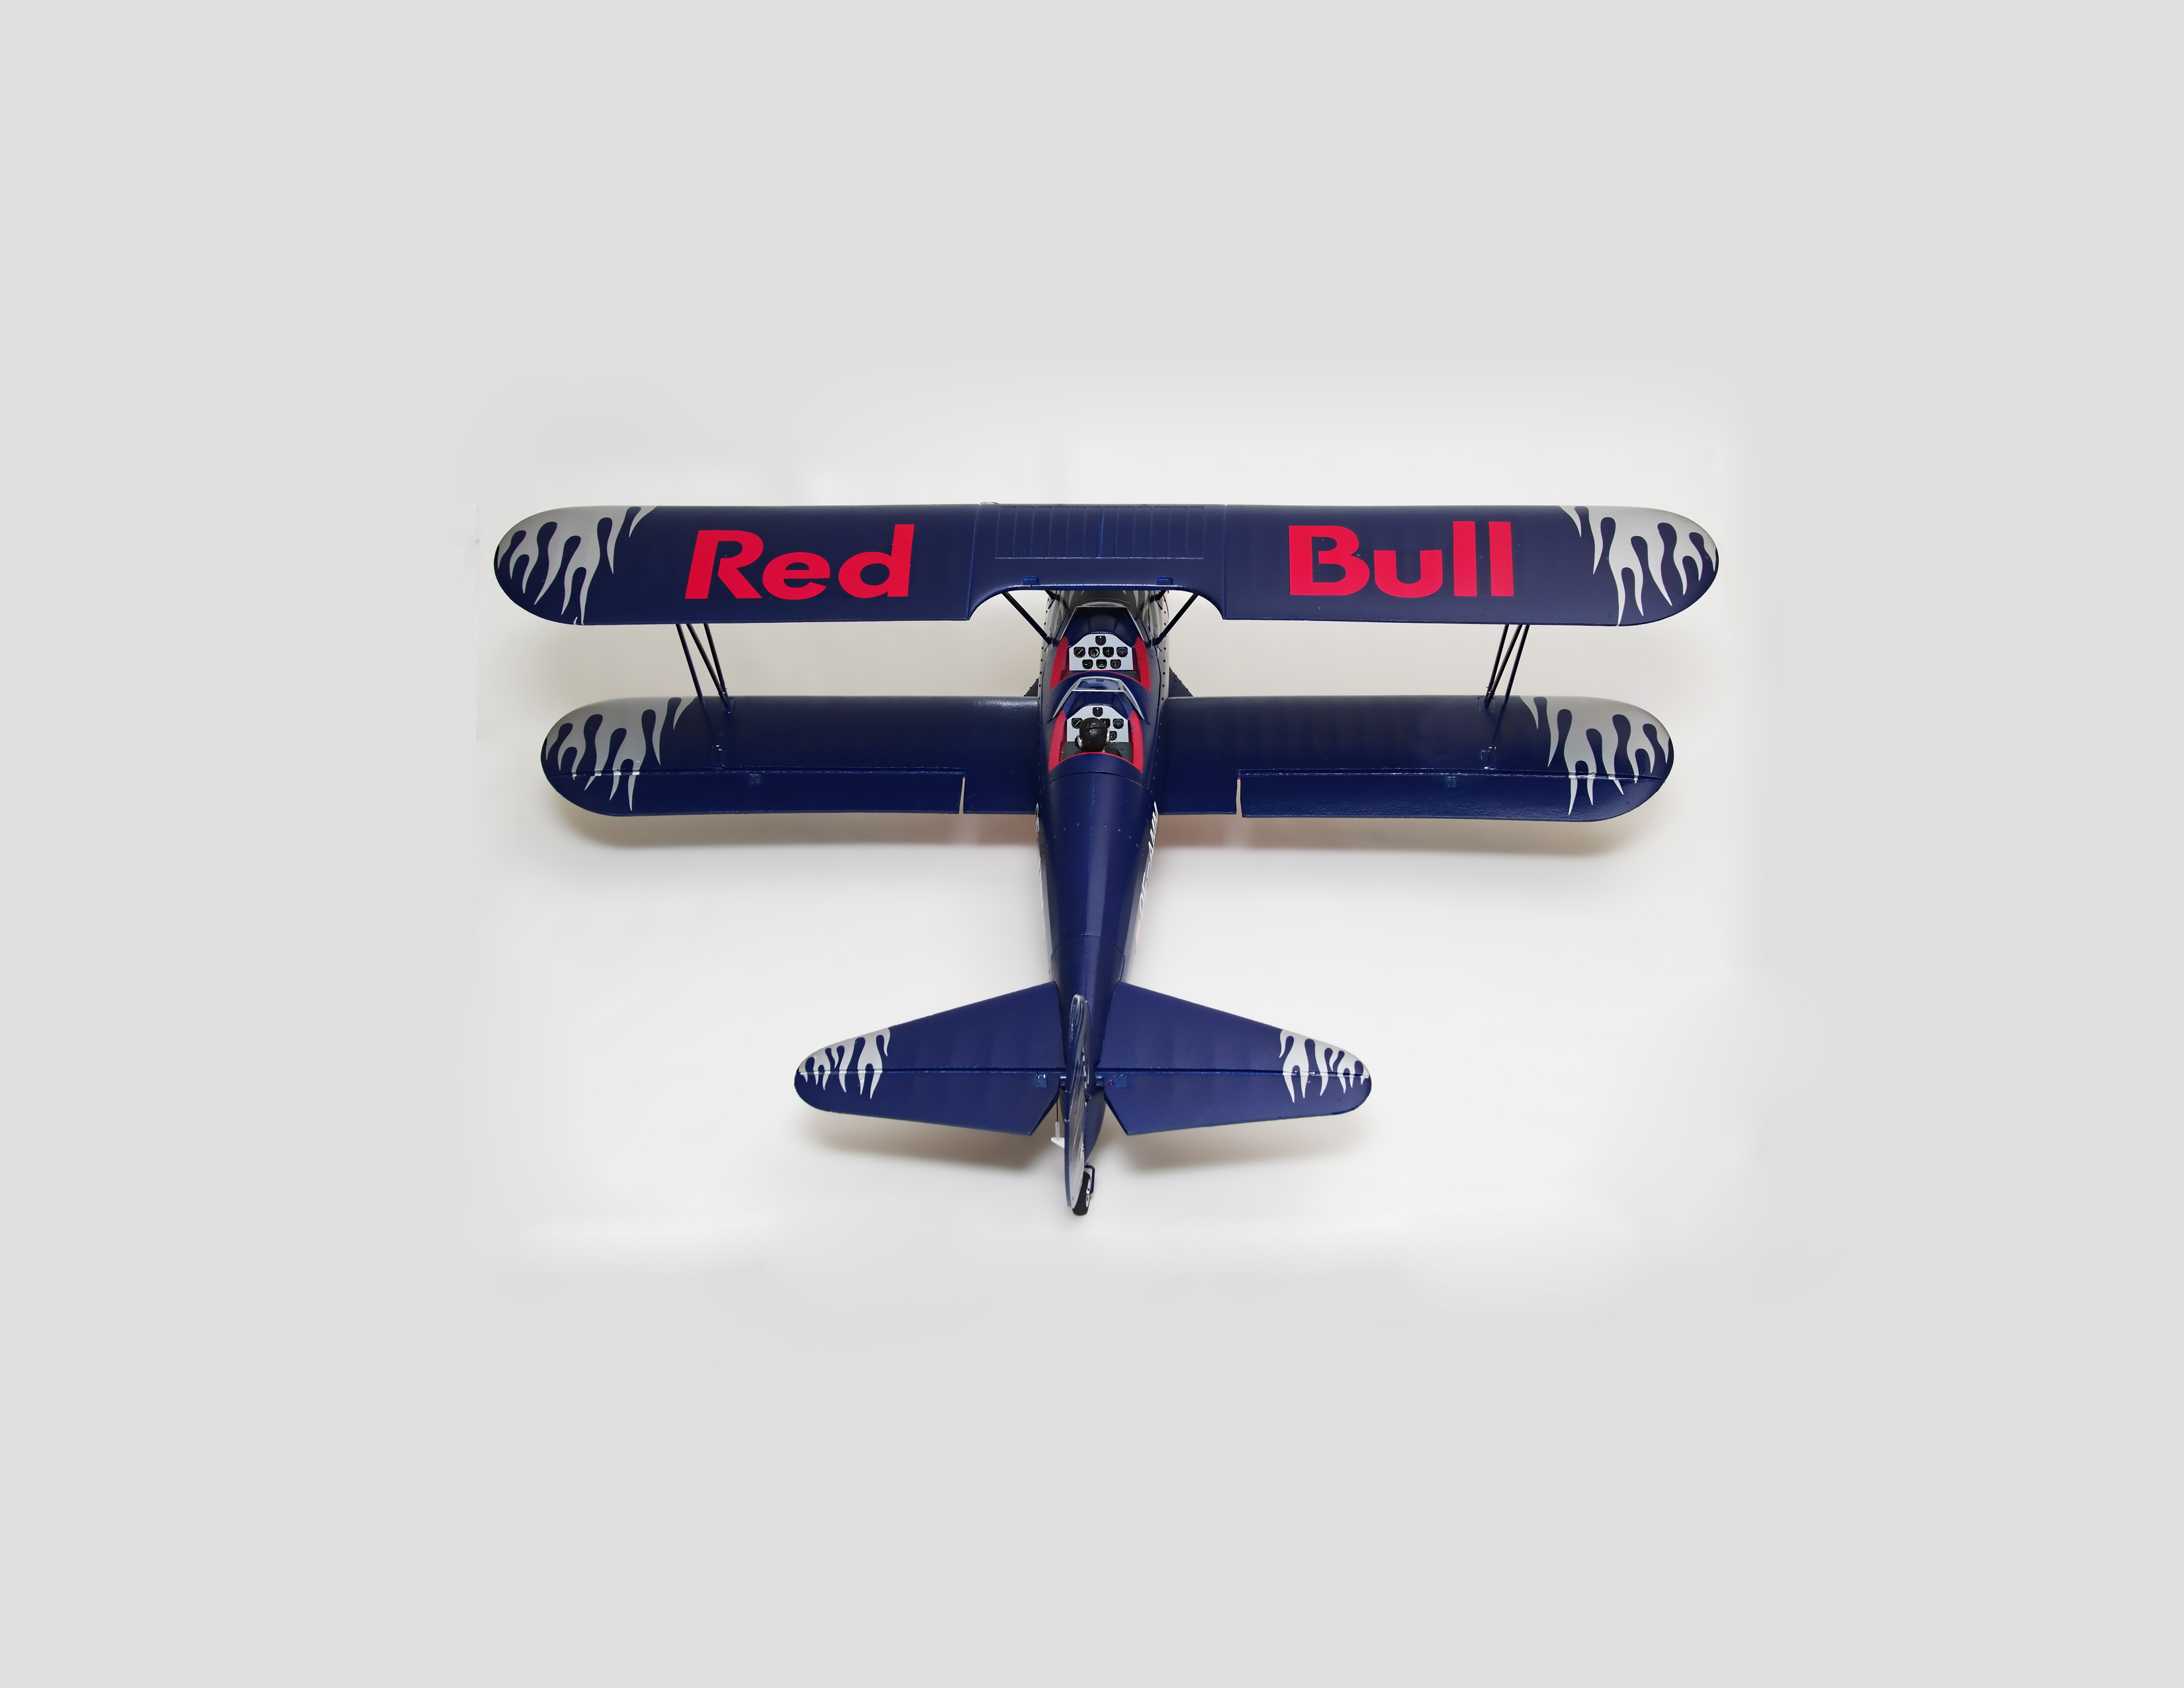 Flitework Red Bull PT-17 Stearman Bipe Receiver Ready